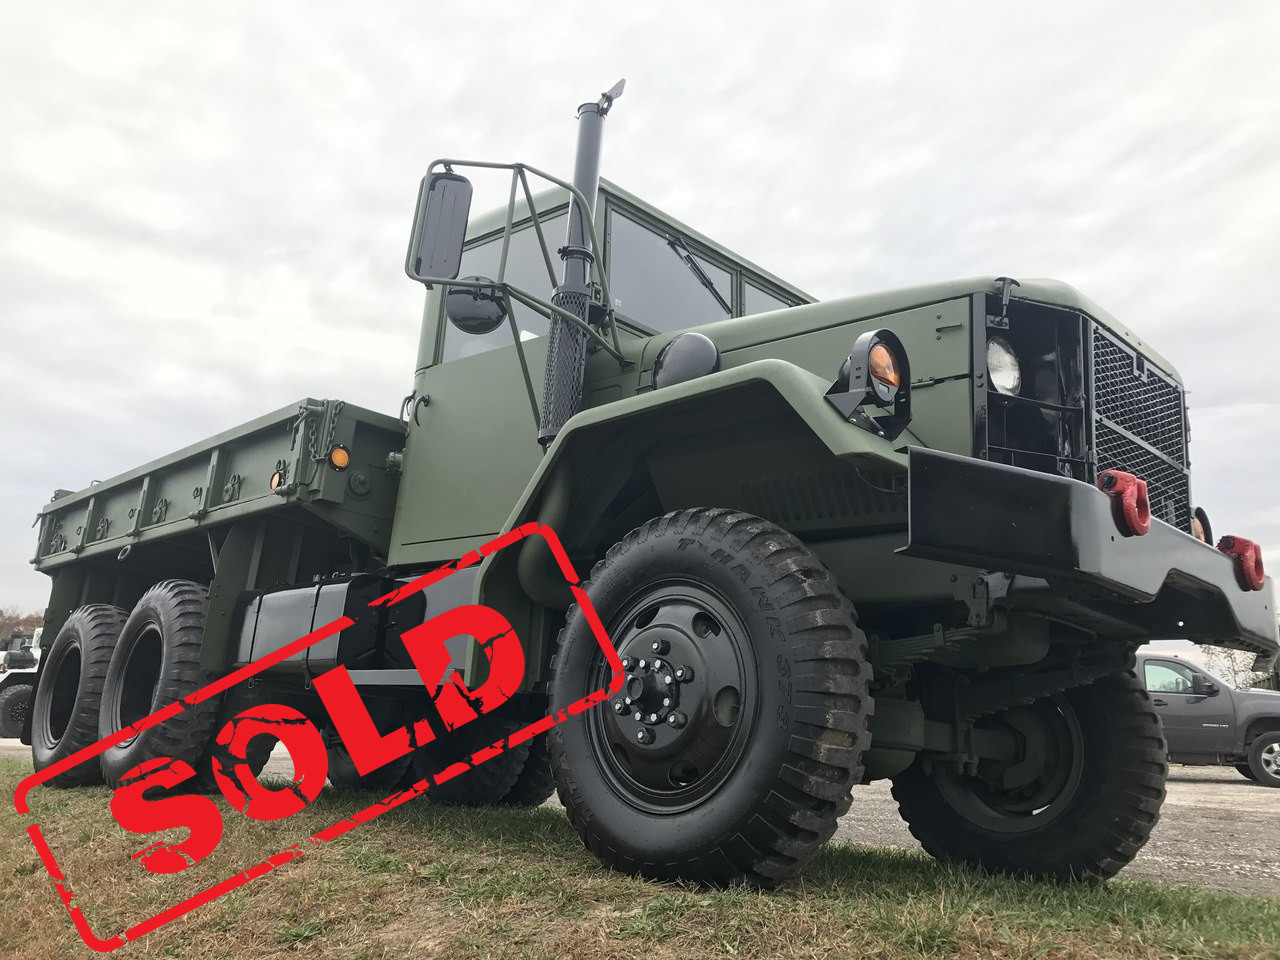 2 1/2 Ton M35A2C Hardtop 6x6 Military Truck